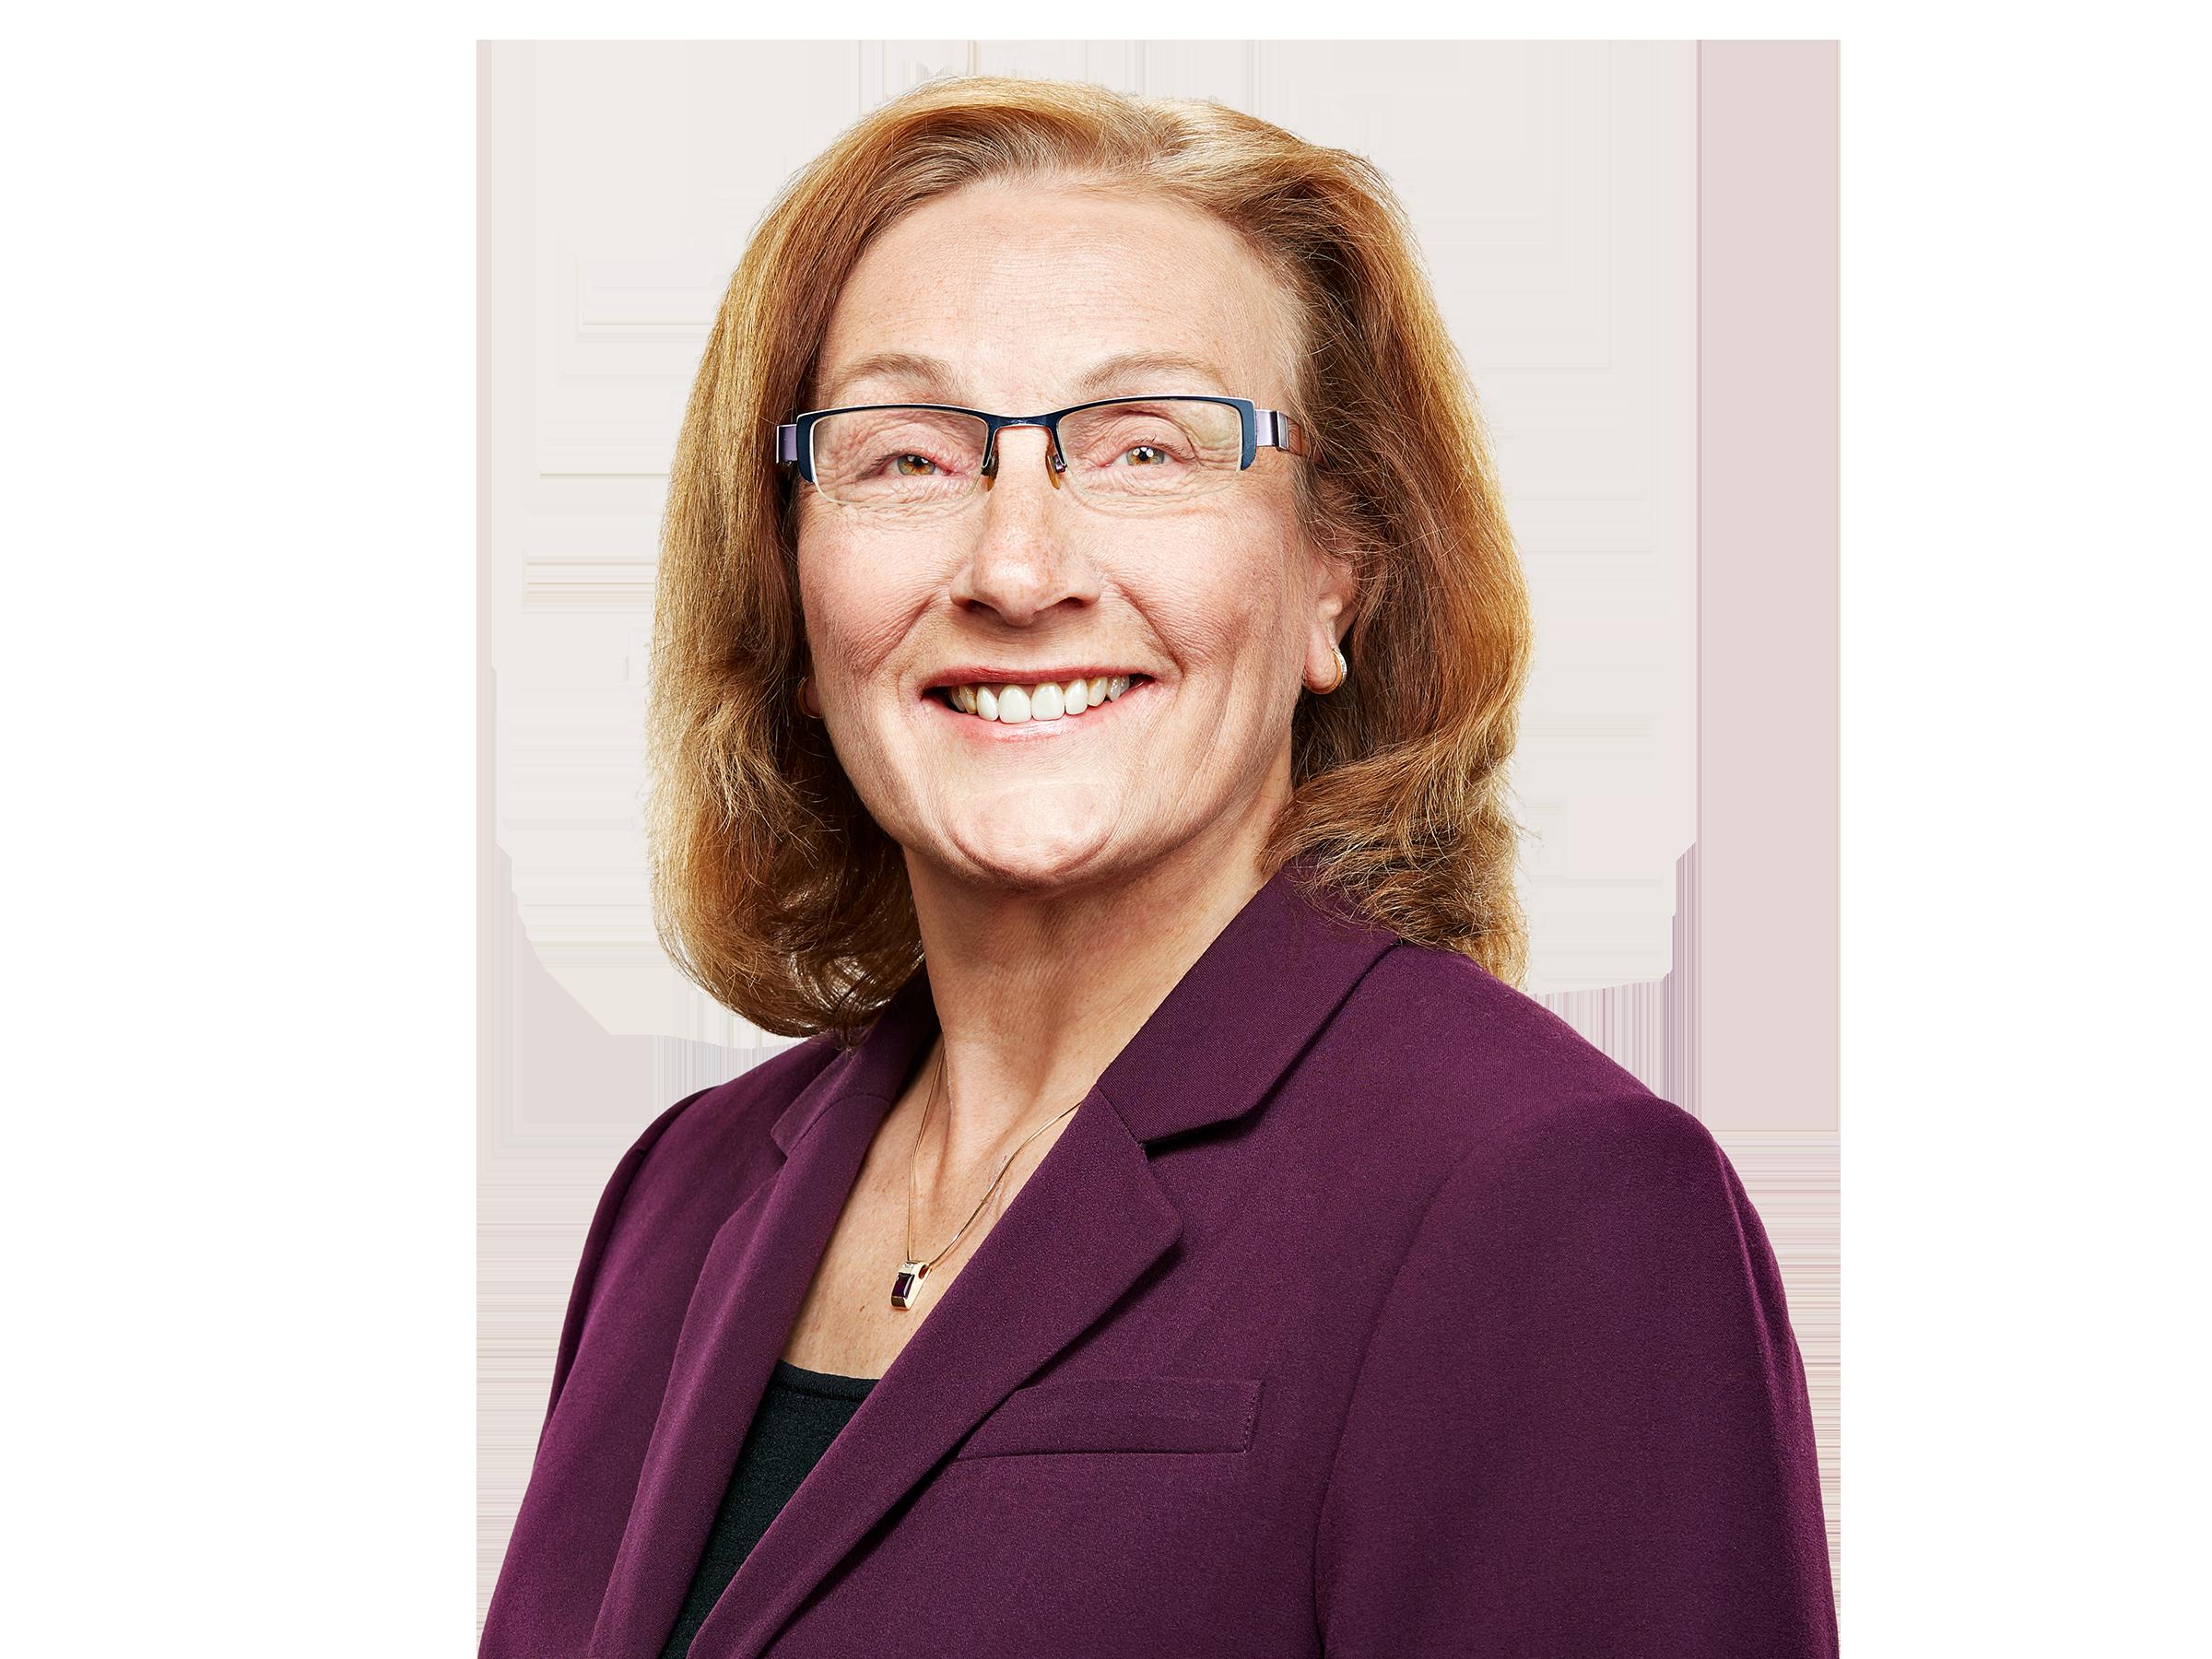 Linda J. Thayer